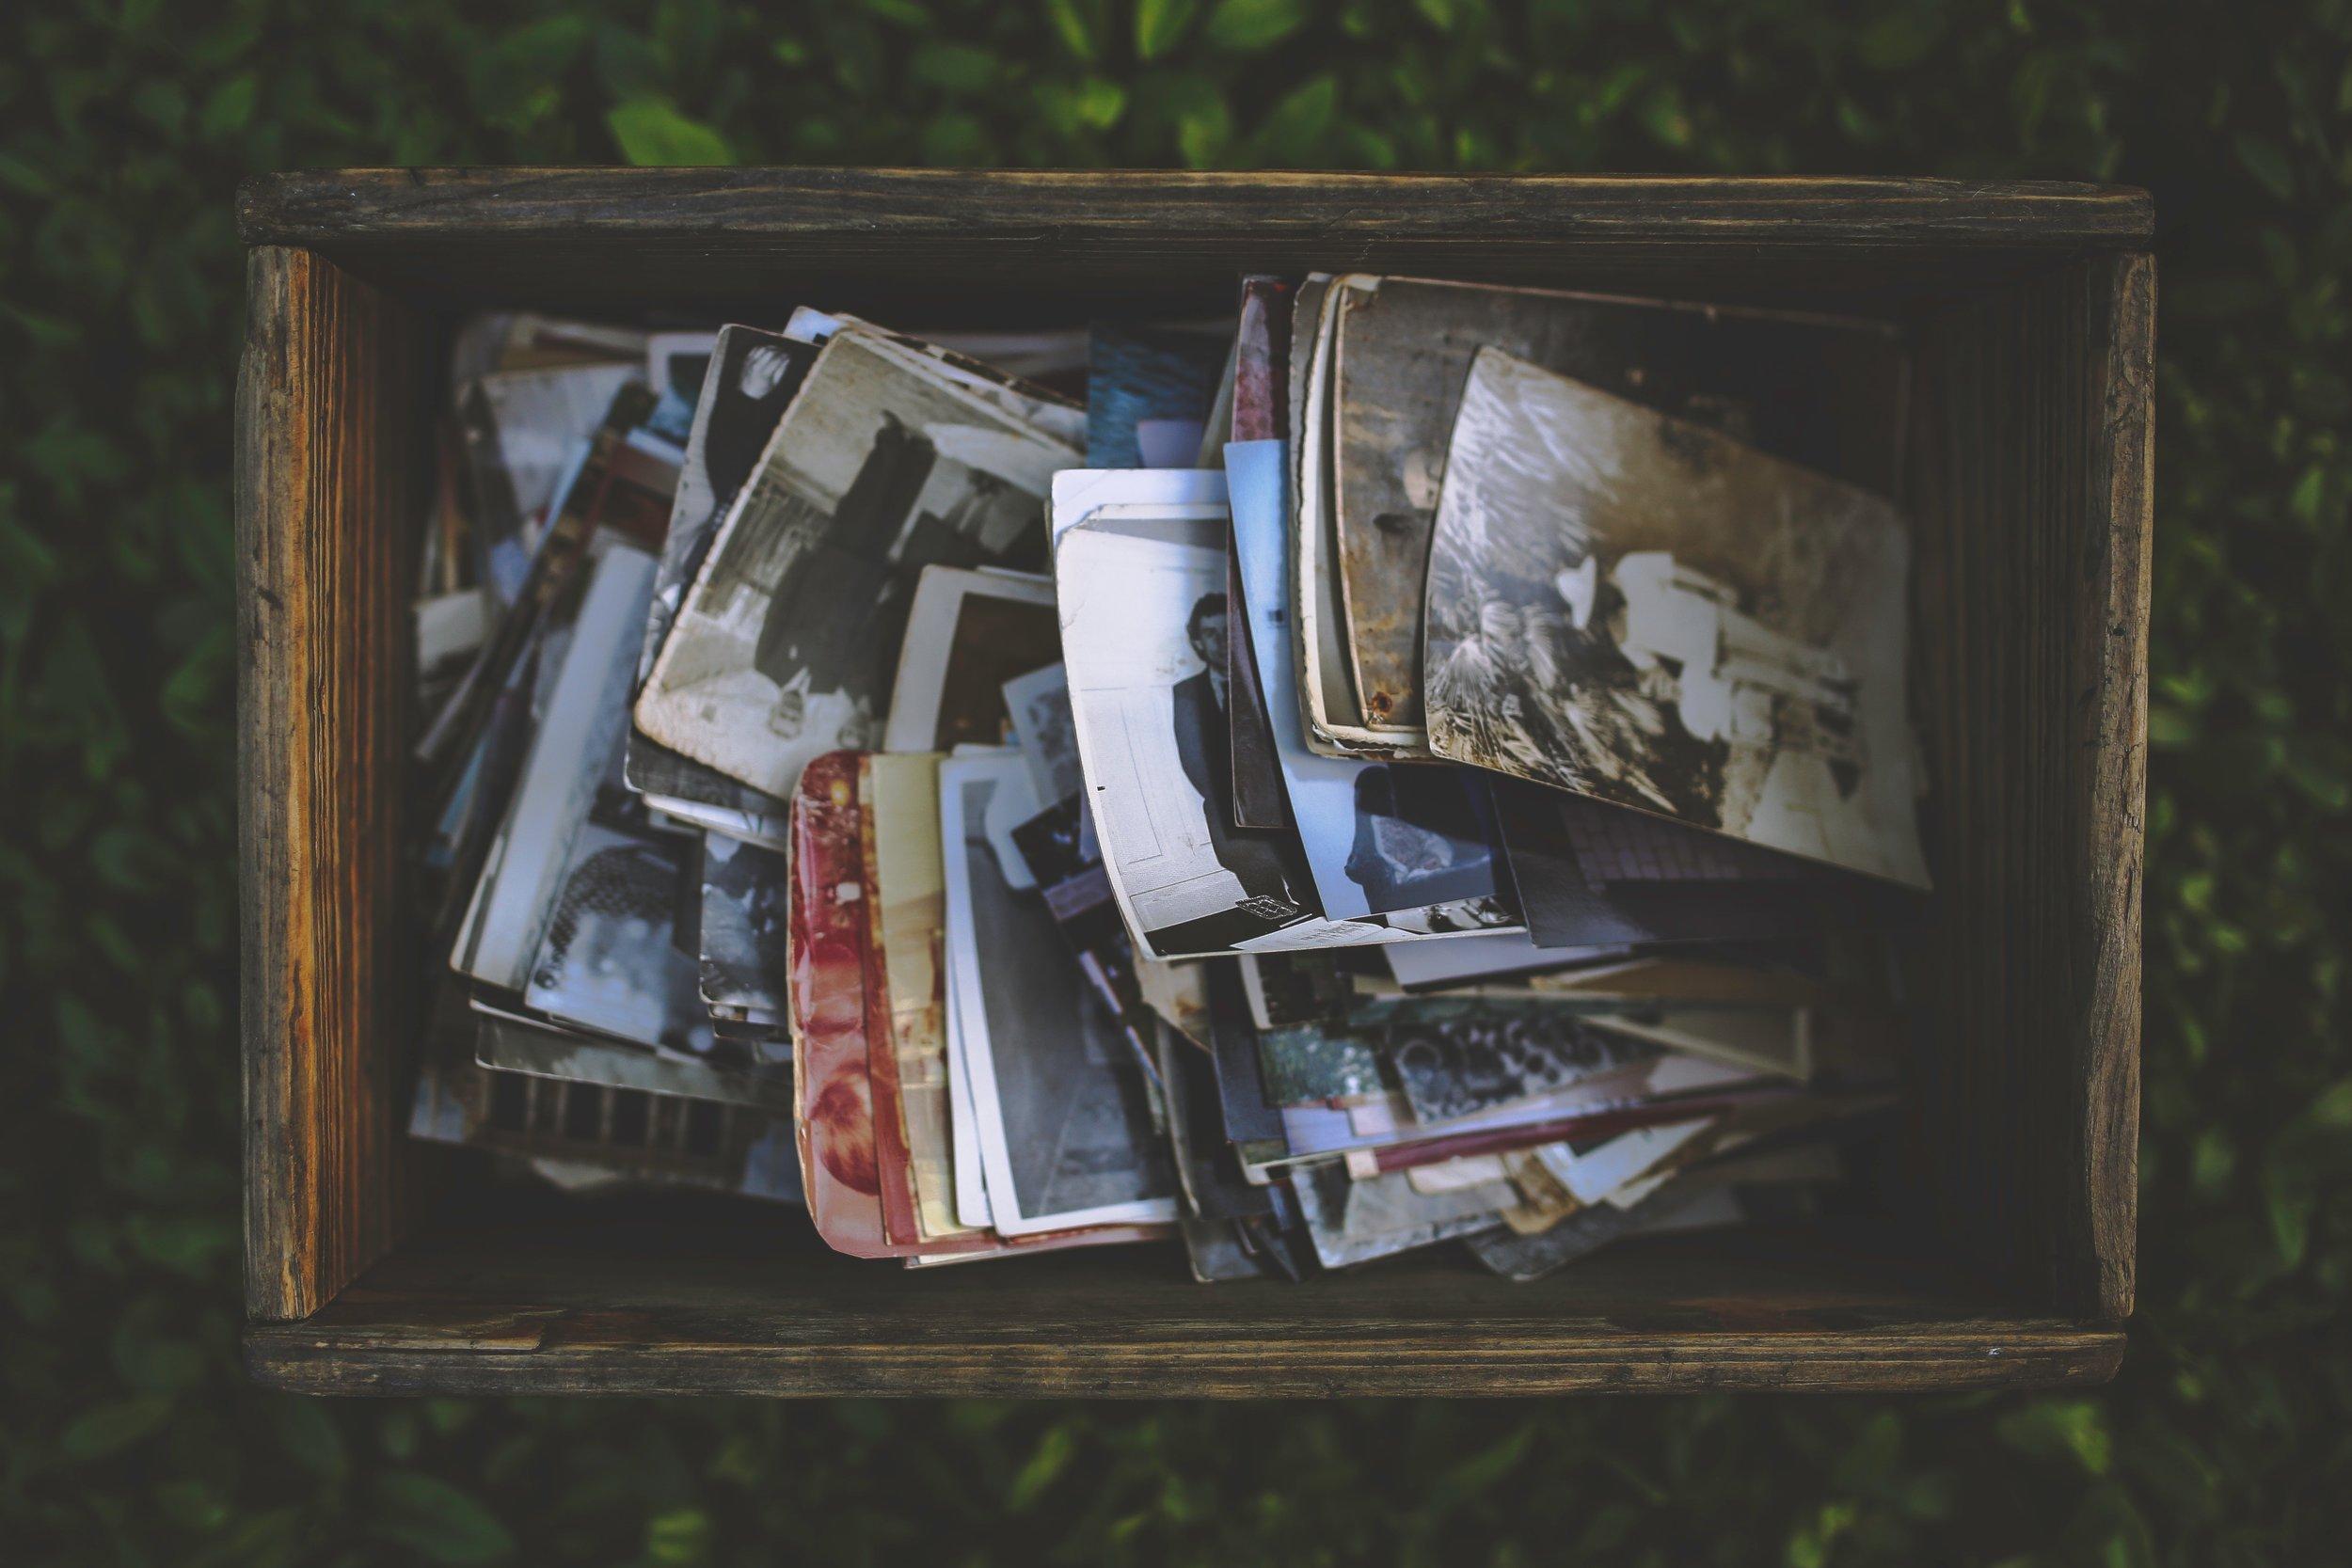 box-memories-nostalgic-5842.jpg